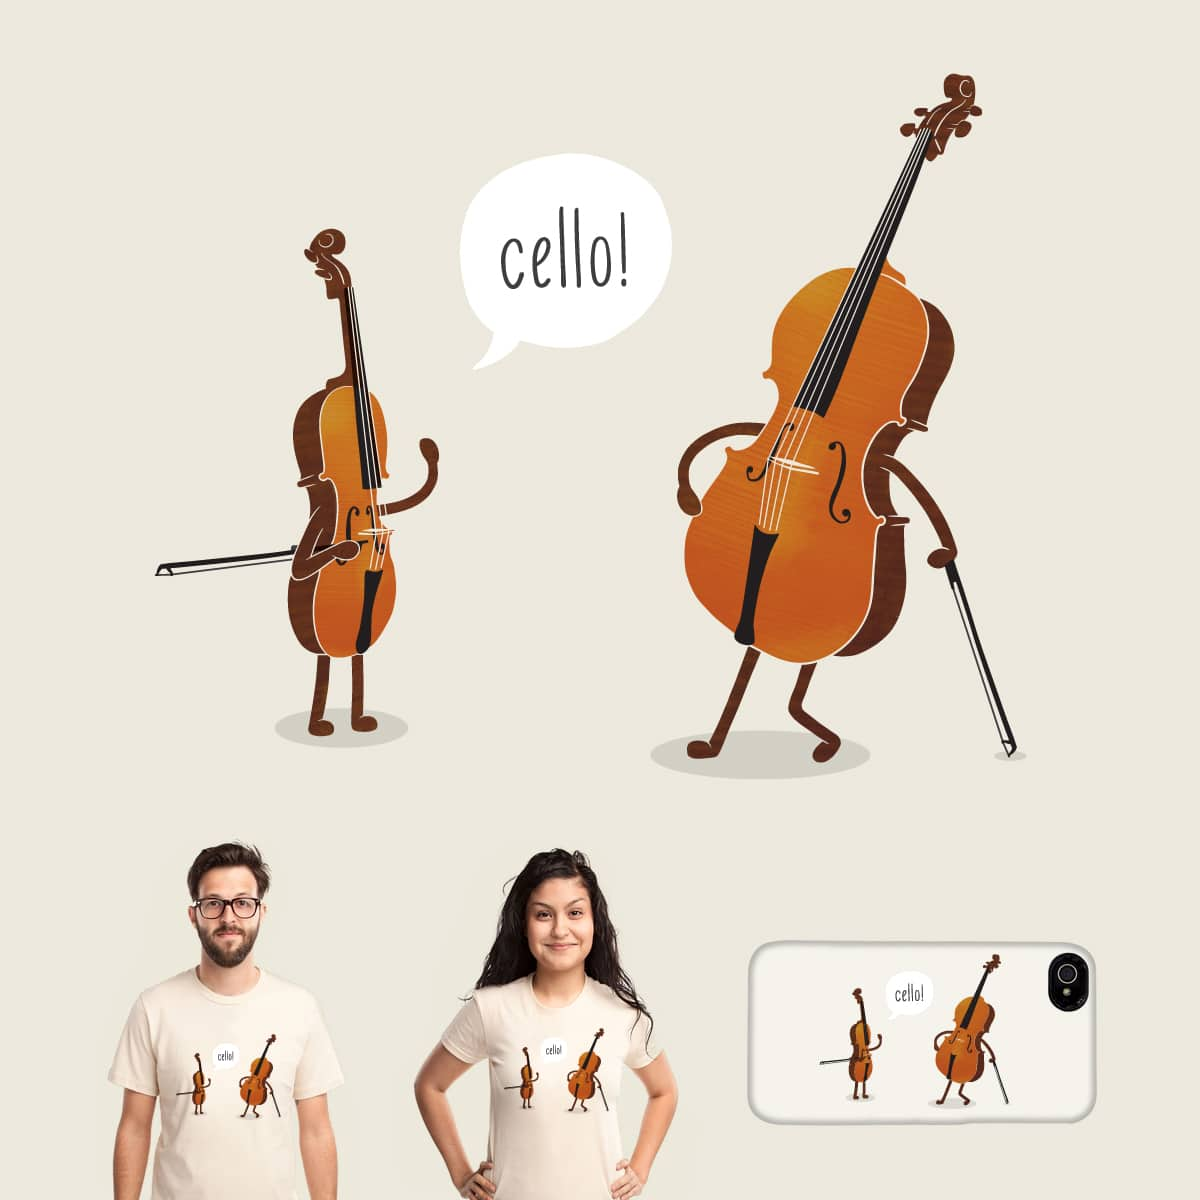 Cello! by melmike on Threadless